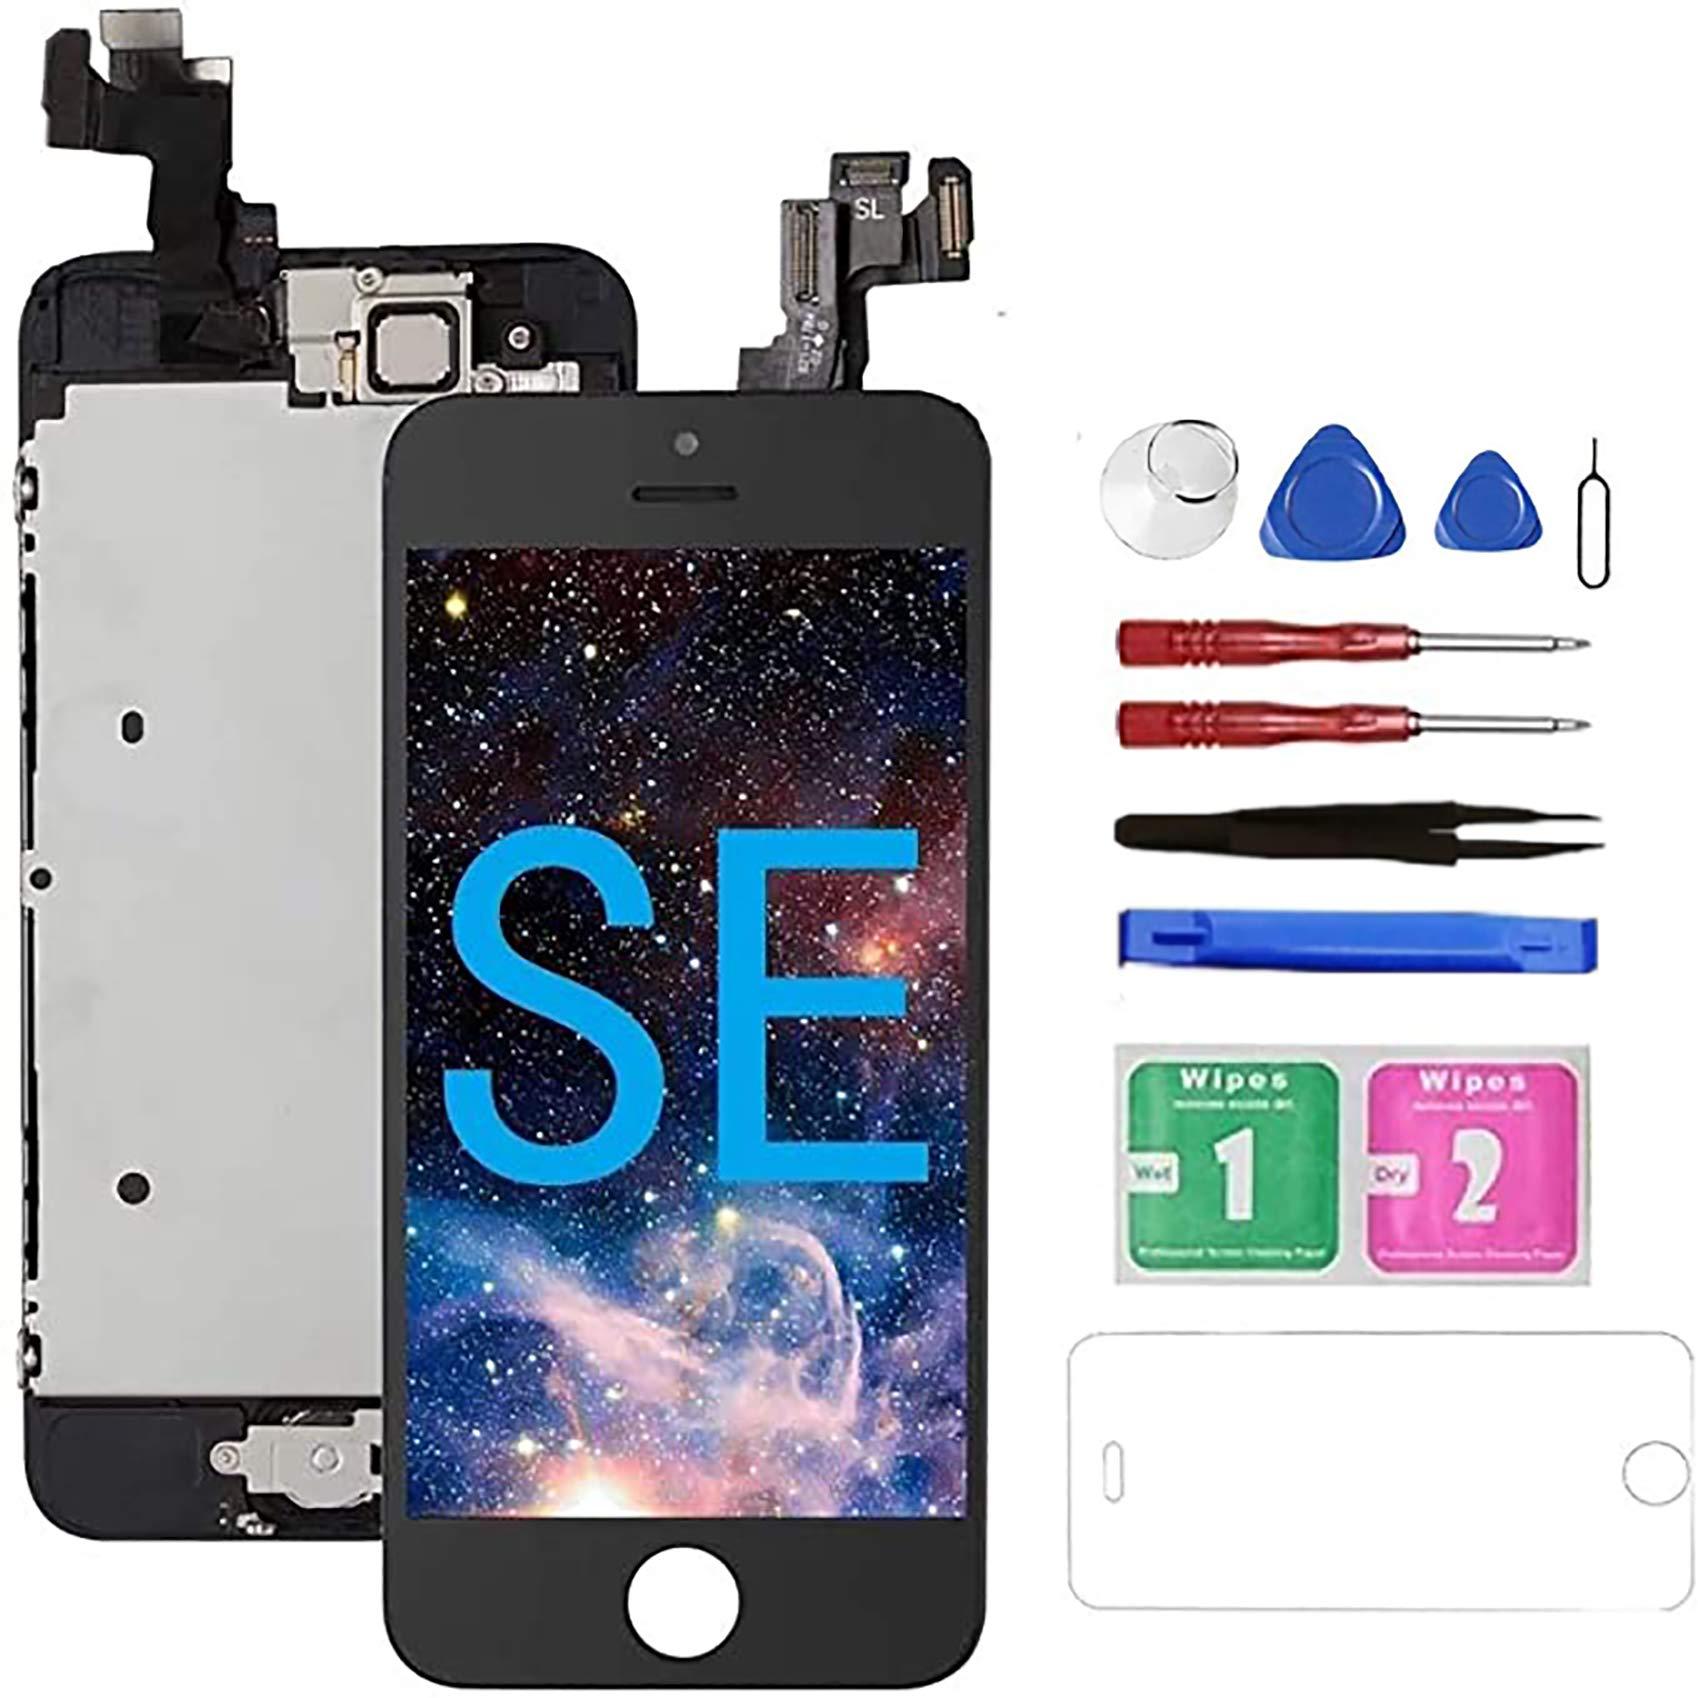 Modulo LCD Negro para IPhone X 10 5.8 Inch -152